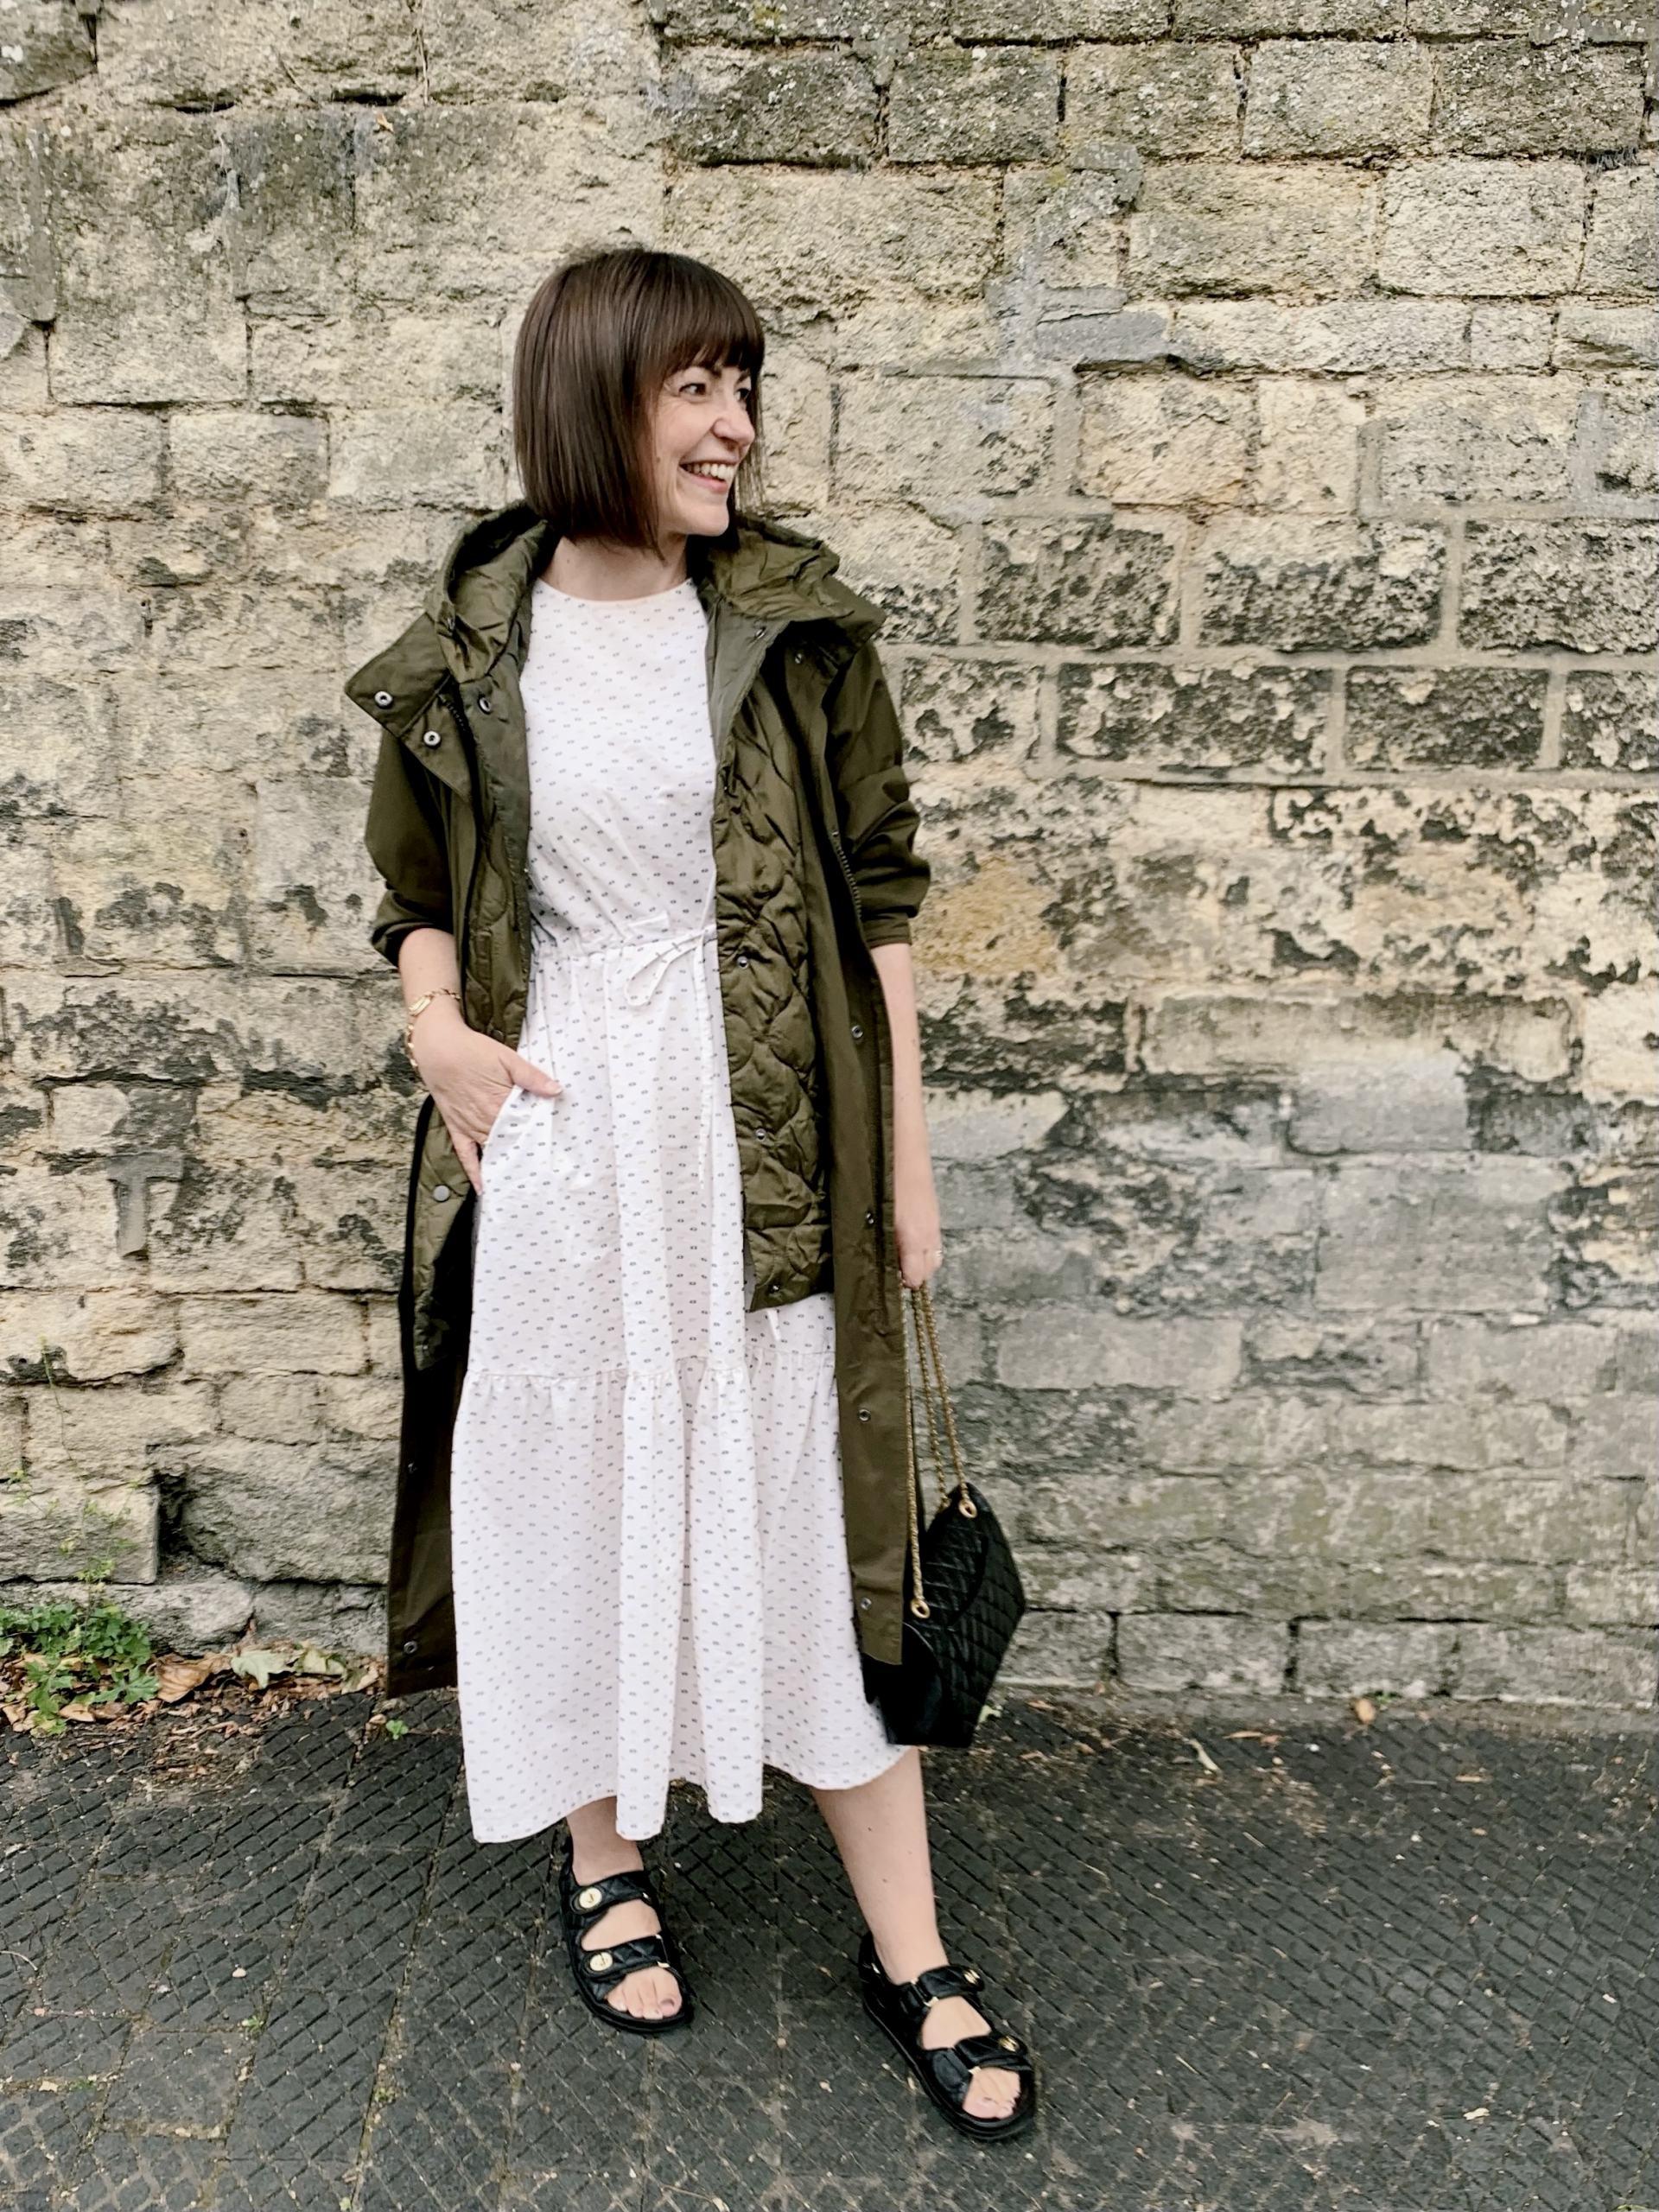 raincoat with summer dress